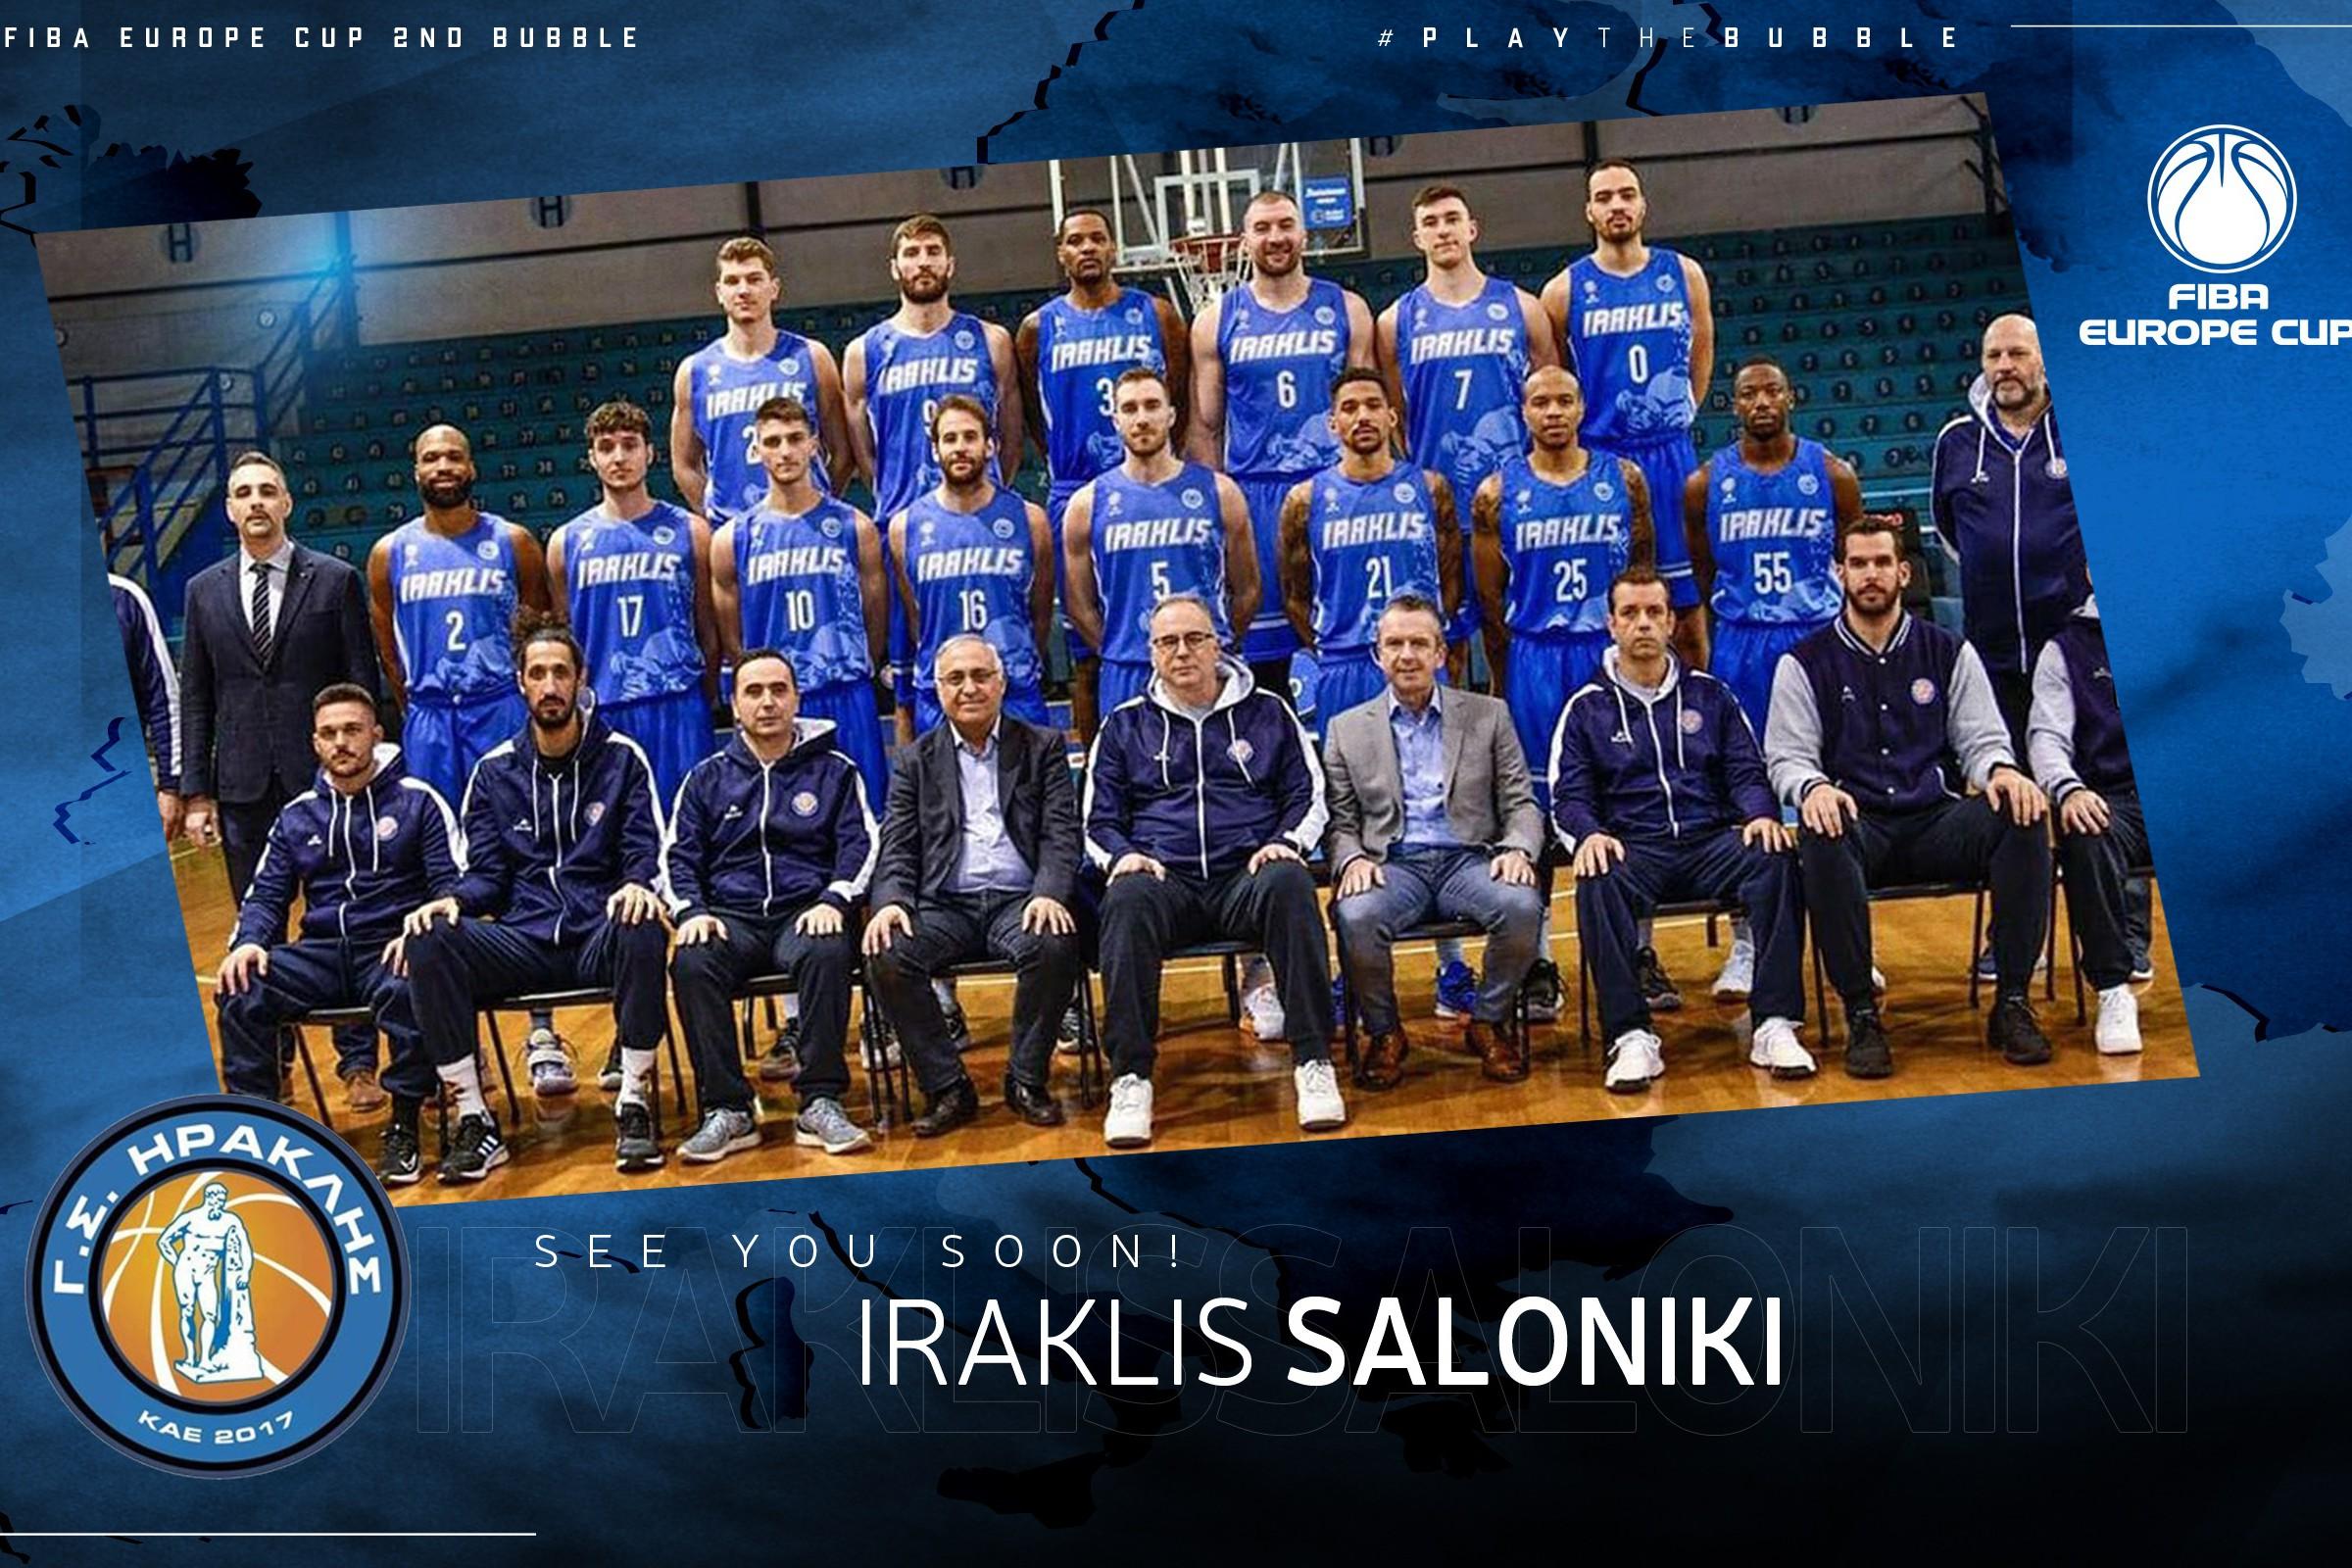 Iraklis Saloniki: nazwa od herosa i polski bohater w tle